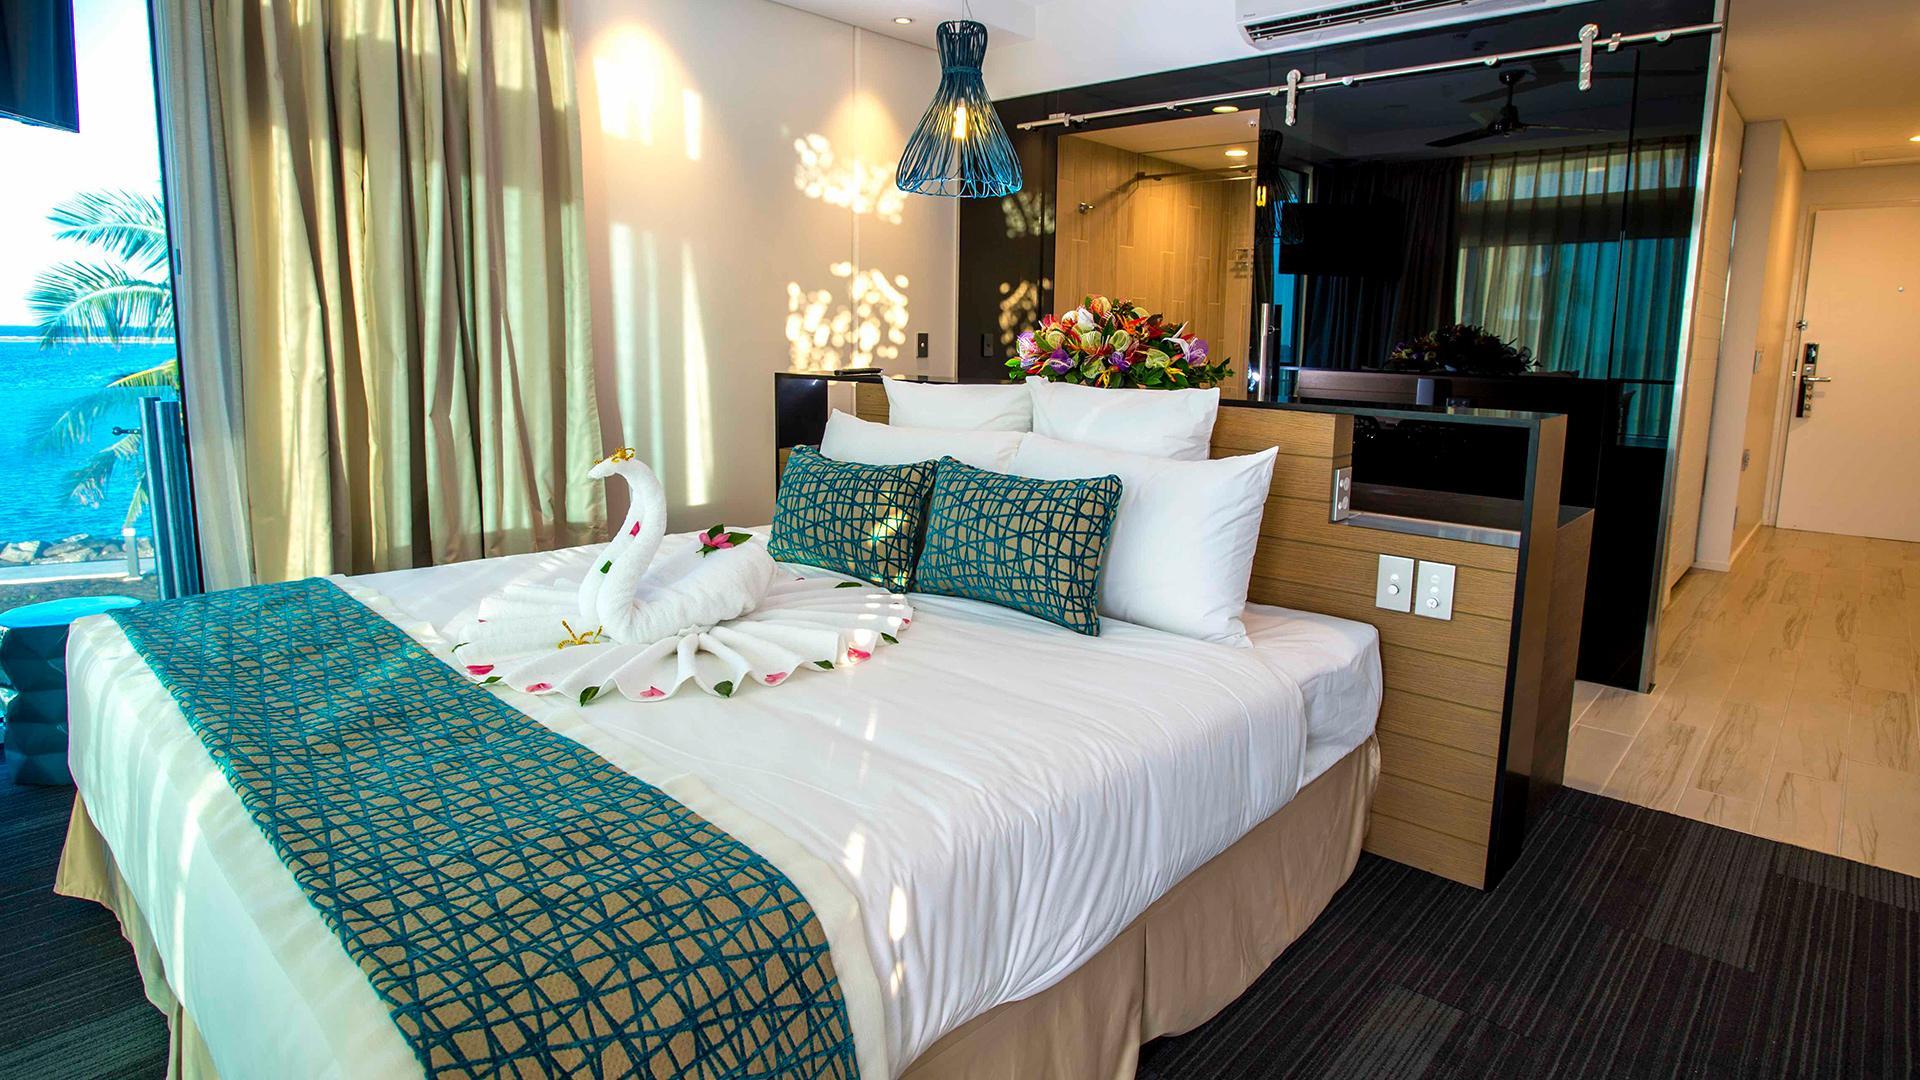 Oceanview Room King image 1 at Taumeasina Island Resort by null, Tuamasaga, Samoa